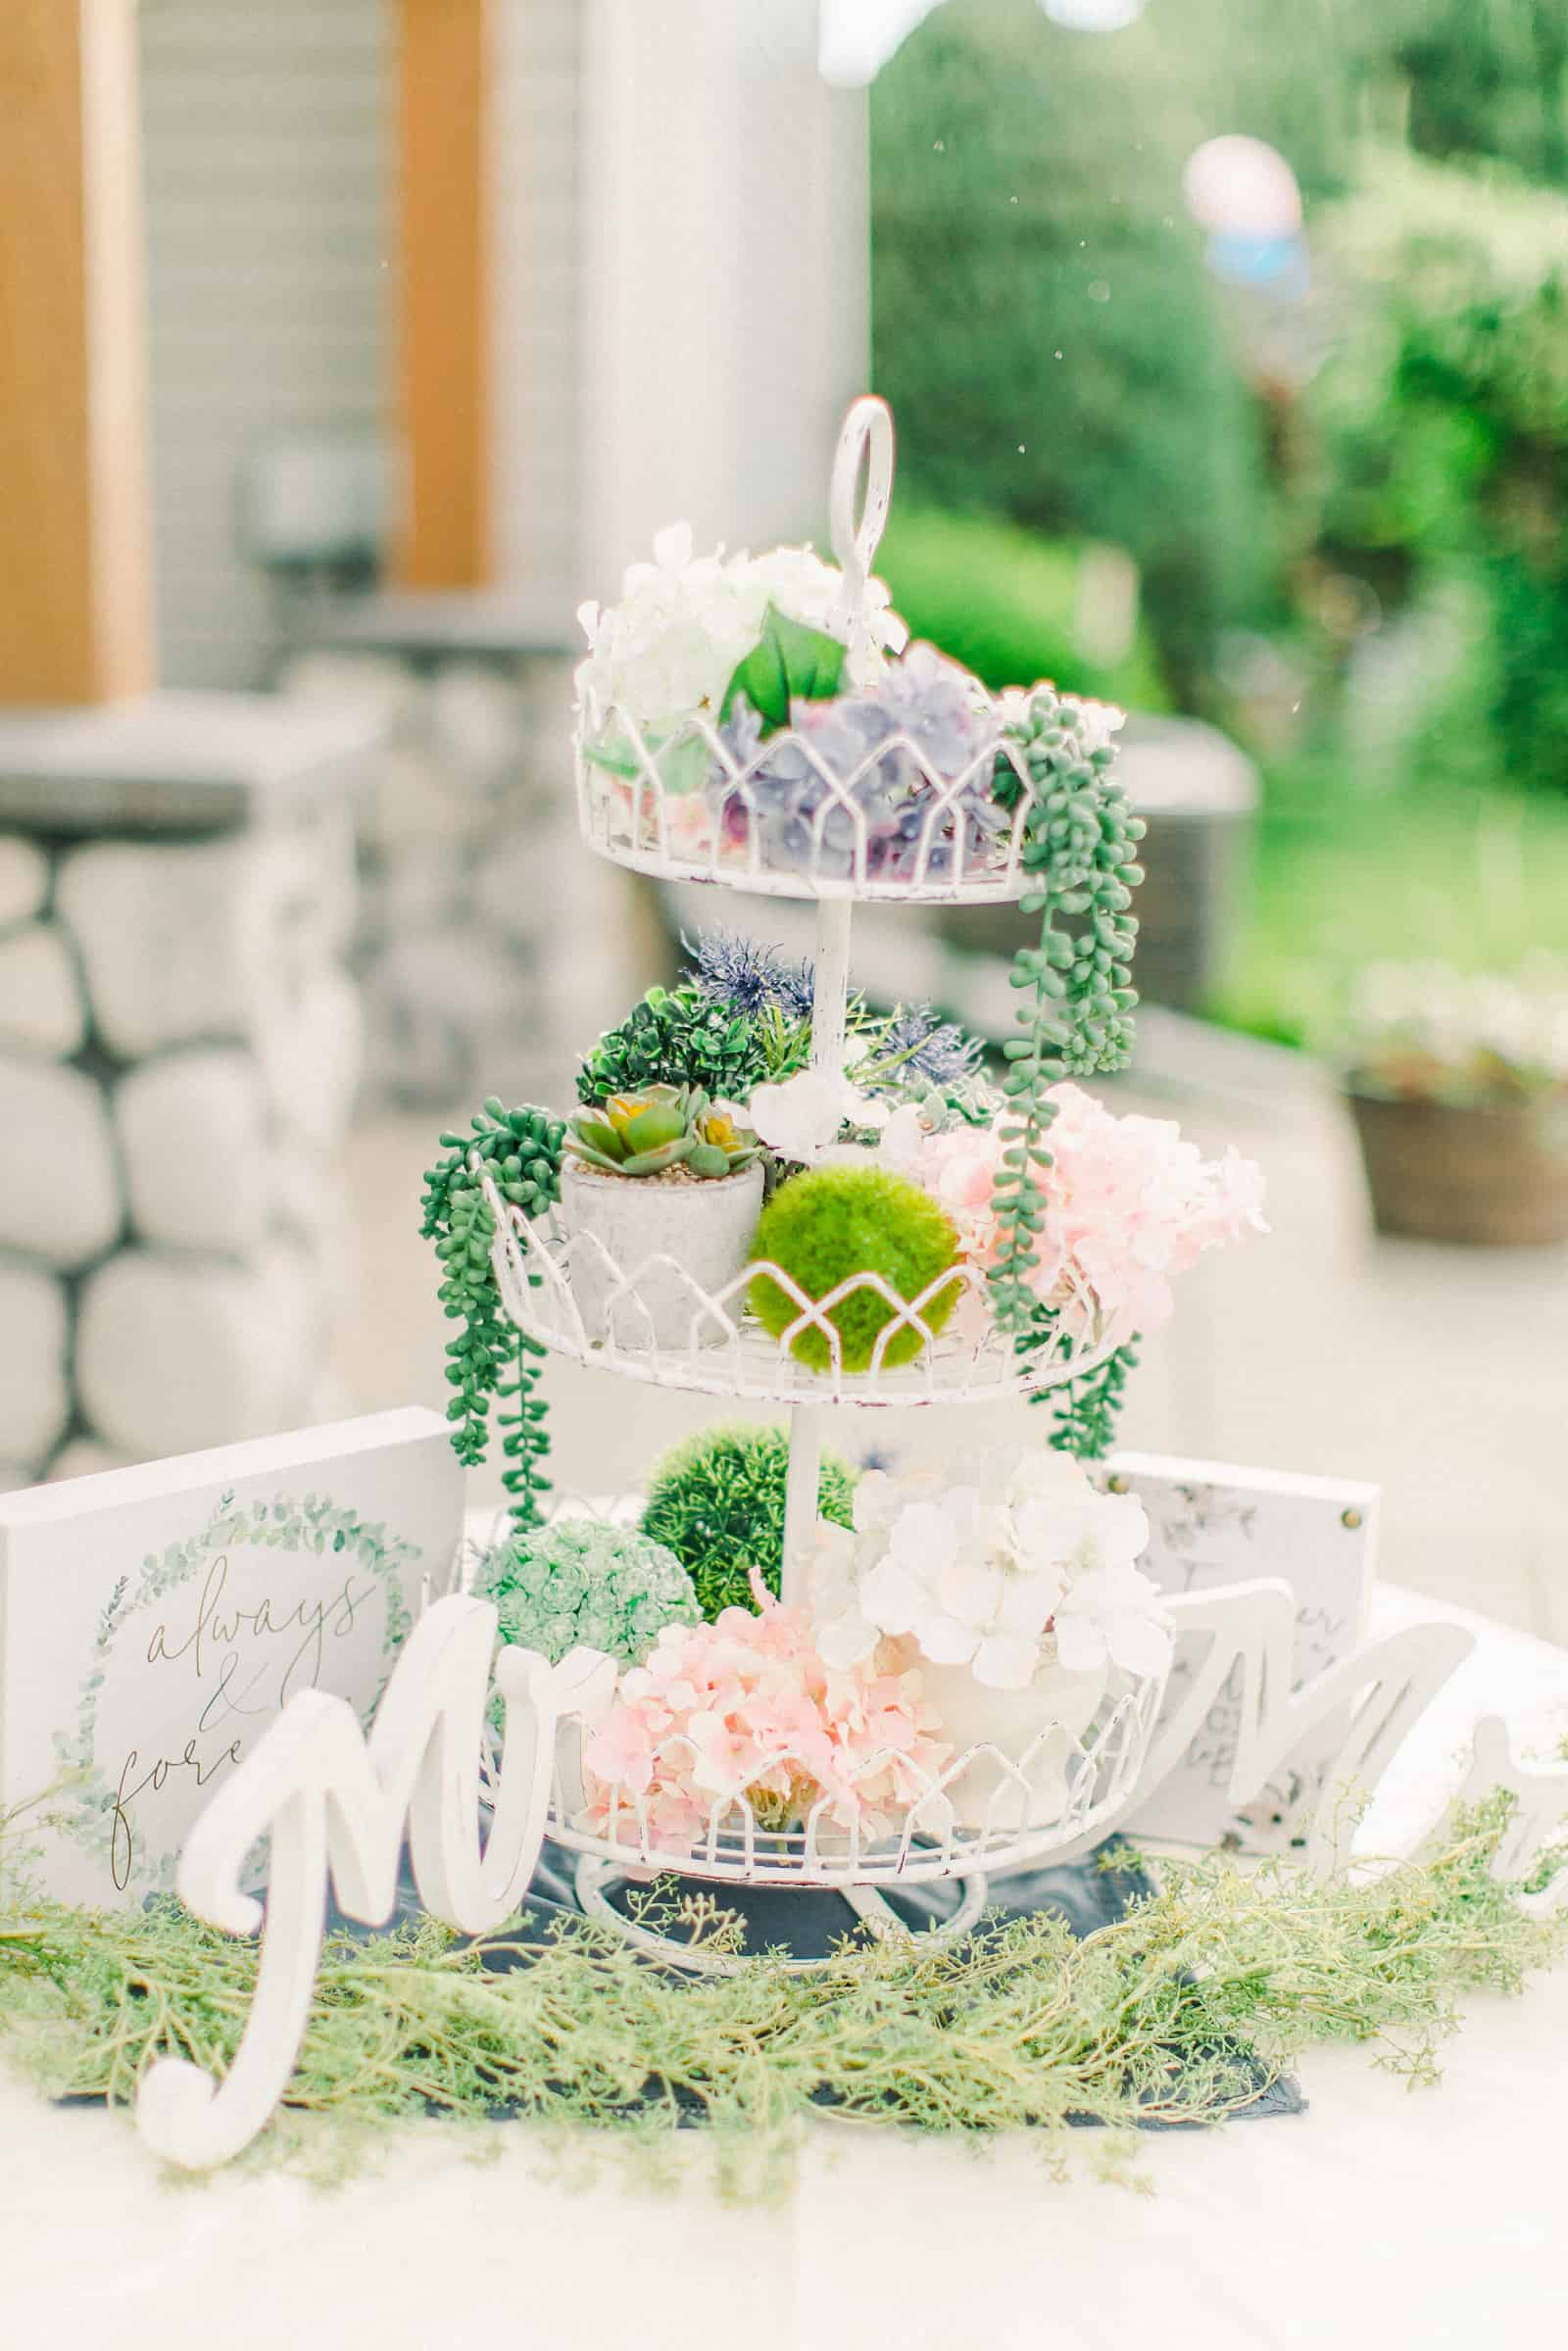 Draper LDS Temple Wedding, Utah wedding photography, summer backyard wedding, reception decor